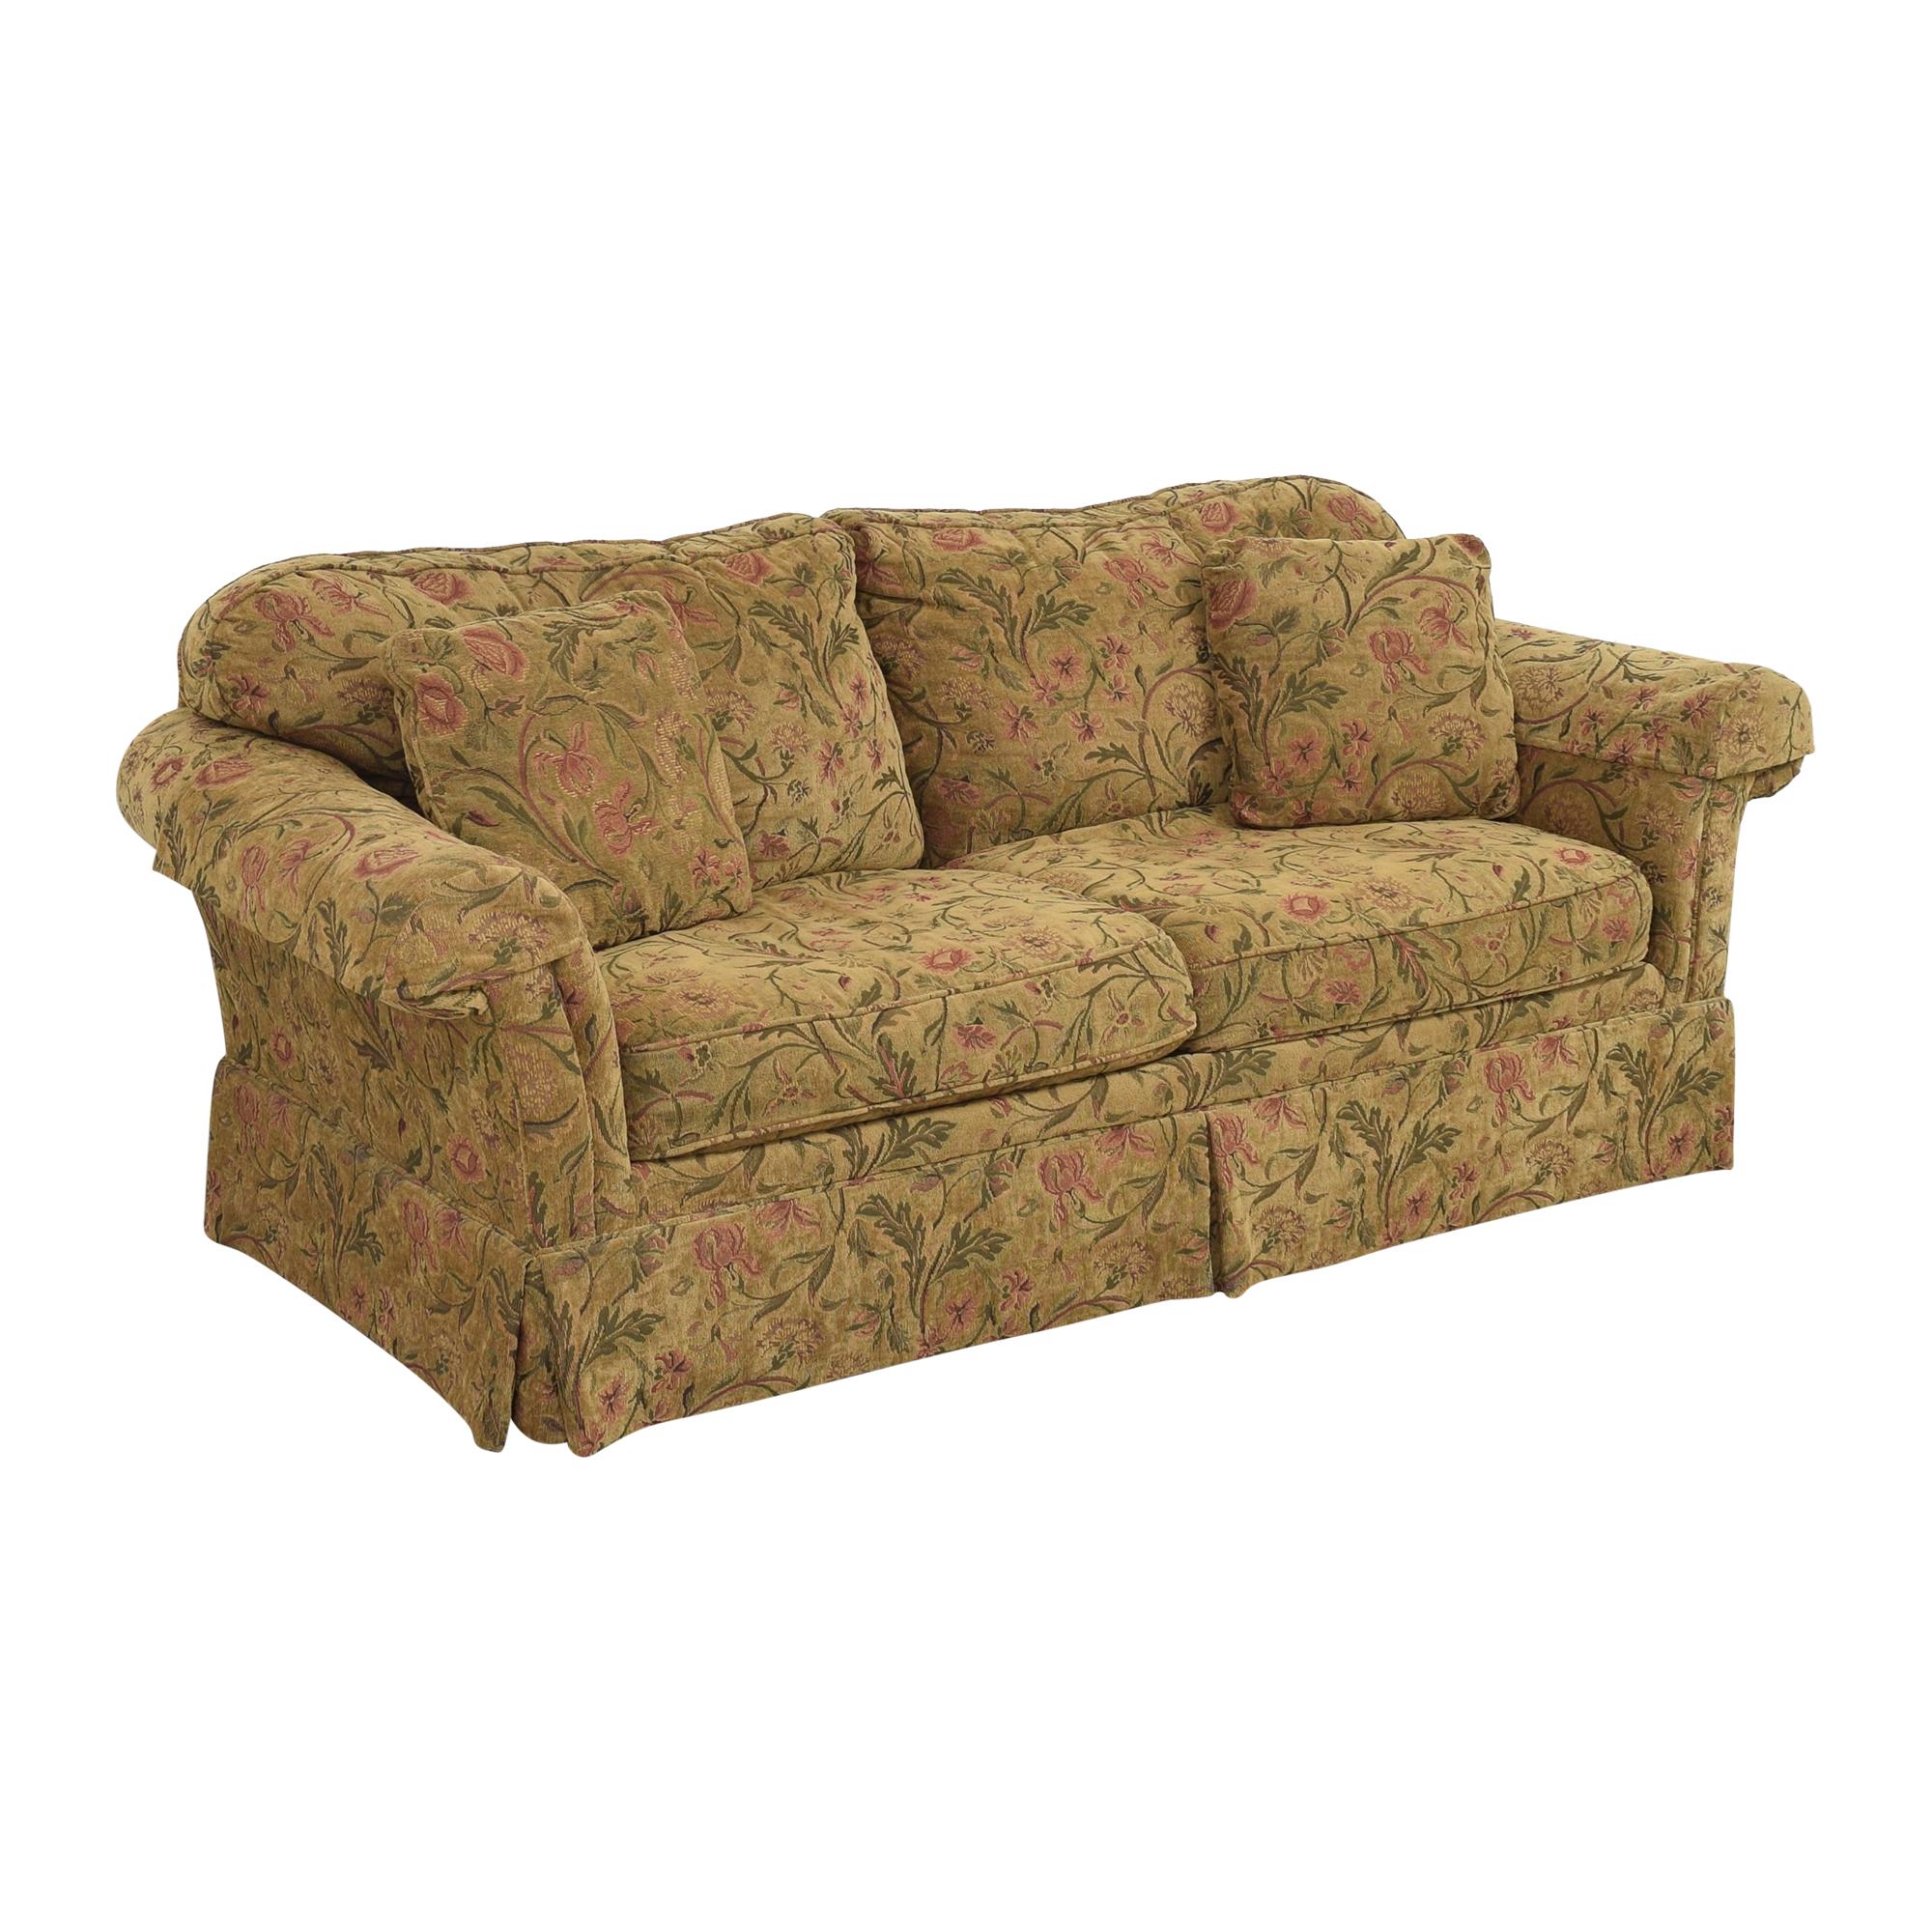 buy Clayton Marcus Clayton Marcus Skirted Two Cushion Sofa online